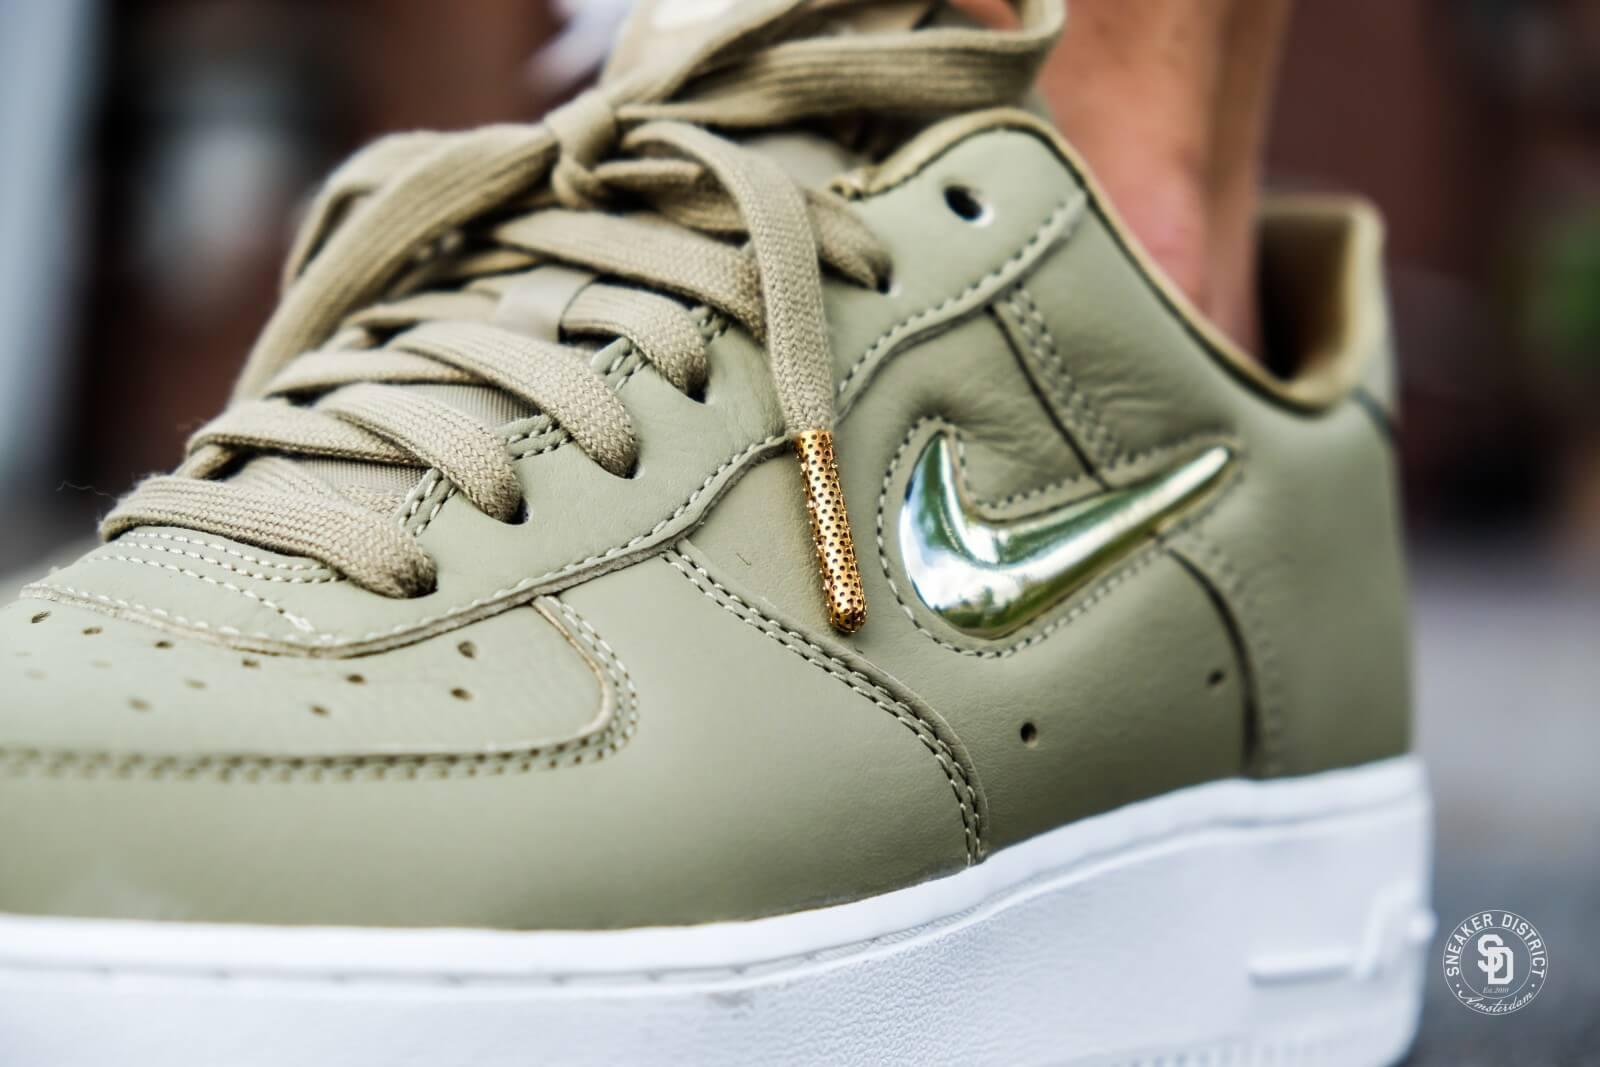 Nike Women's Air Force 1 '07 Premium LX Neutral Olive ...